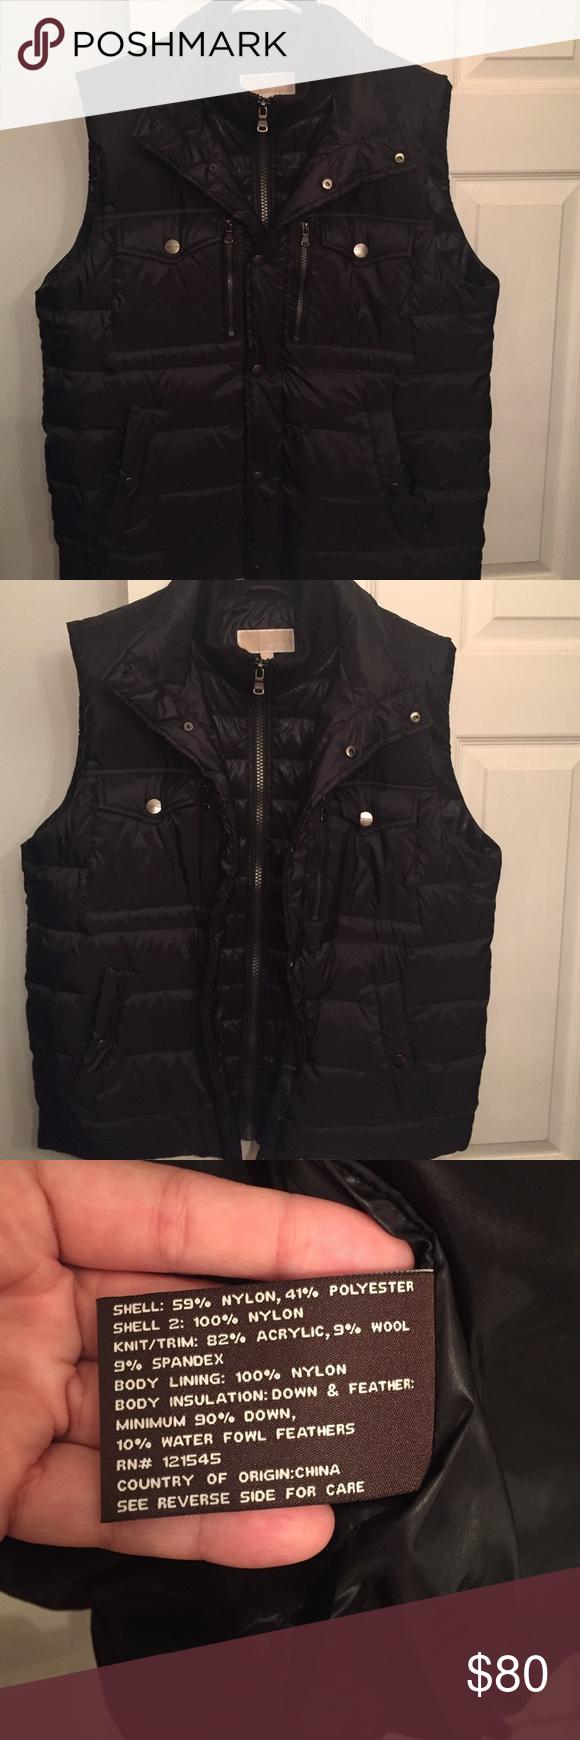 Michael Kors down vest Great condition Michael Kors down vest!! It has a zipper and snap closure and an inside pocket. Sorry no trades! Michael Kors Jackets & Coats Vests